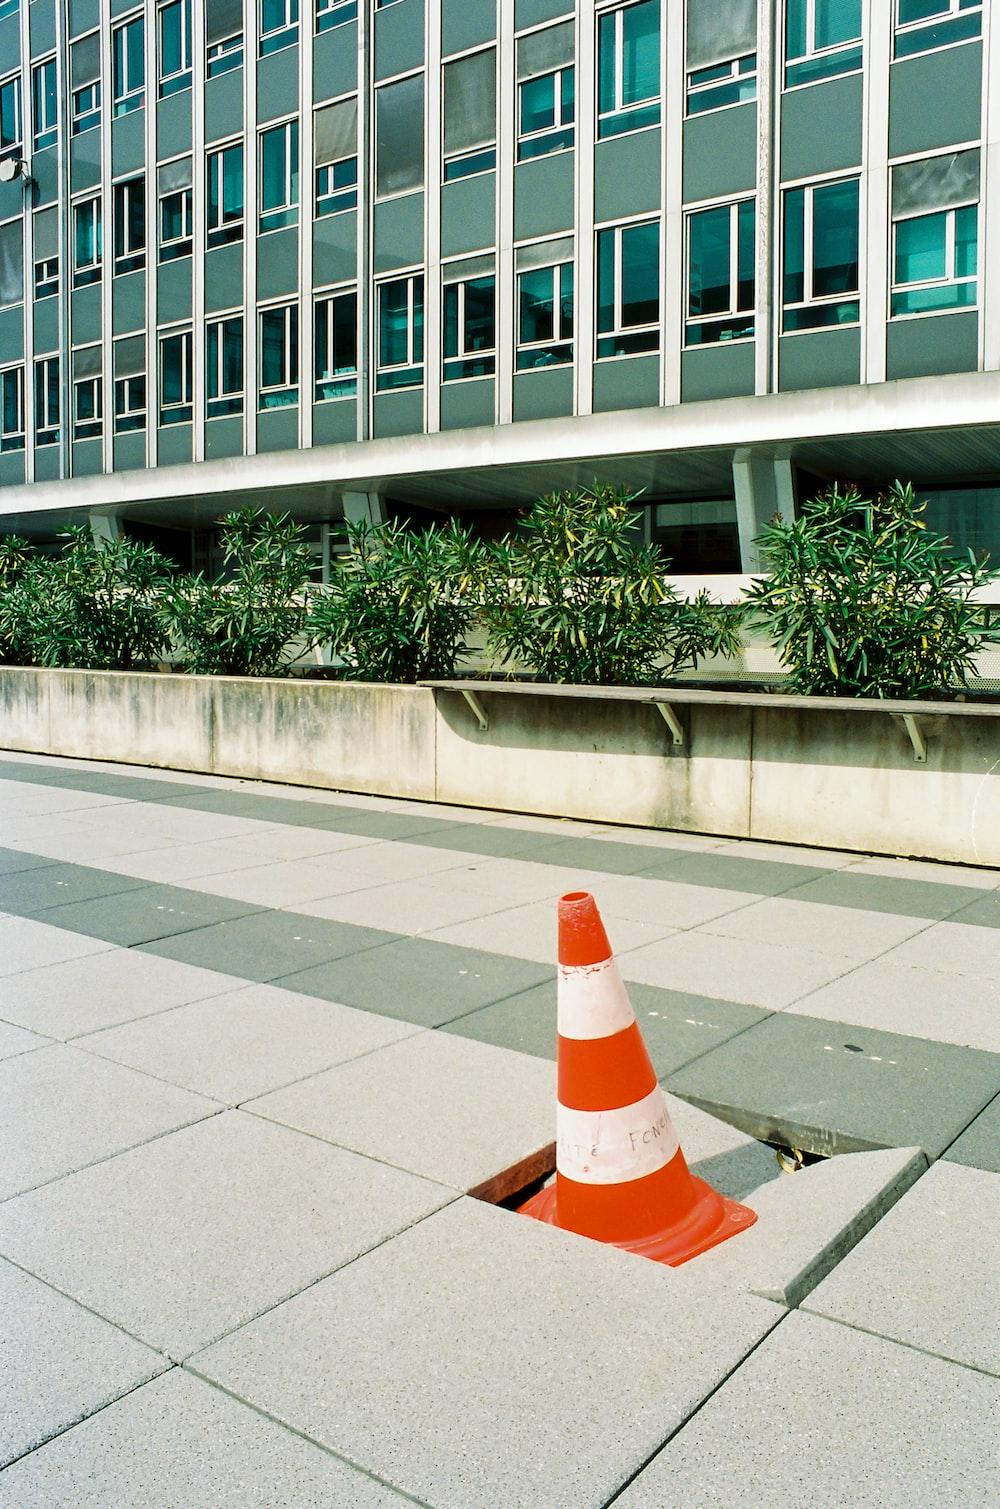 orange and white traffic cone on gray concrete floor